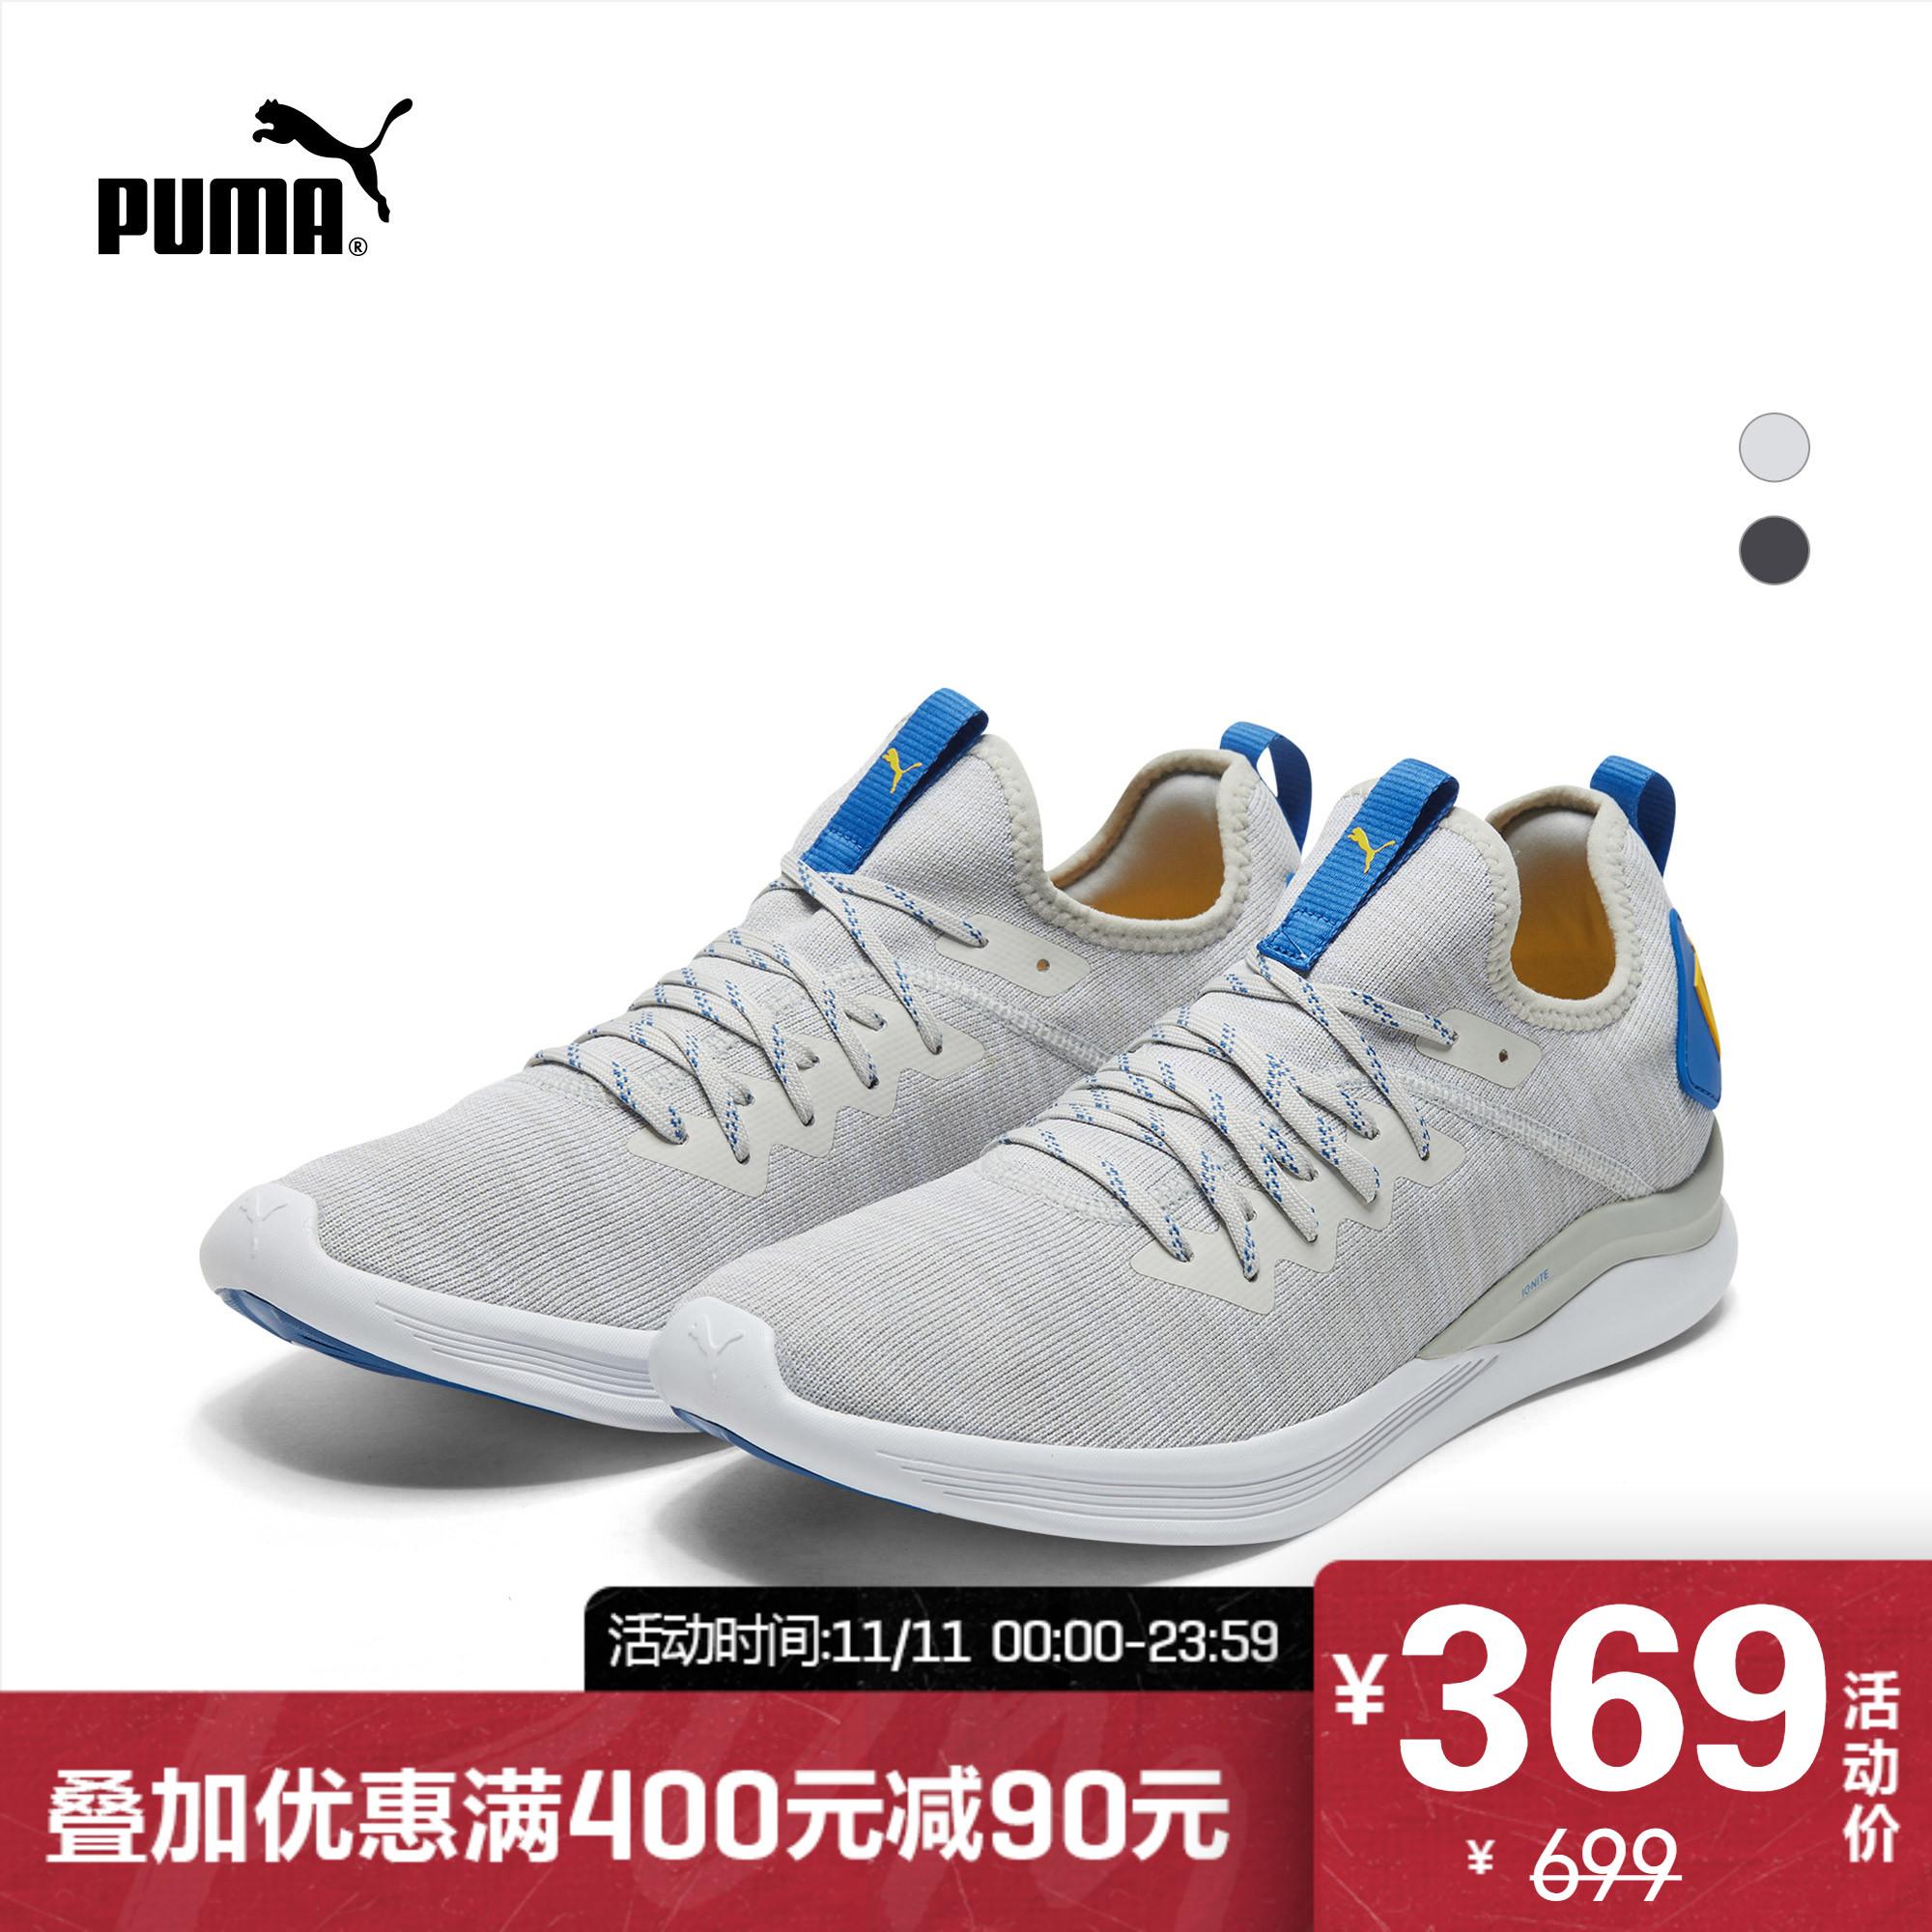 PUMA彪马官方正品  男子缓震跑步鞋 IGNITE EVOKNIT 190508